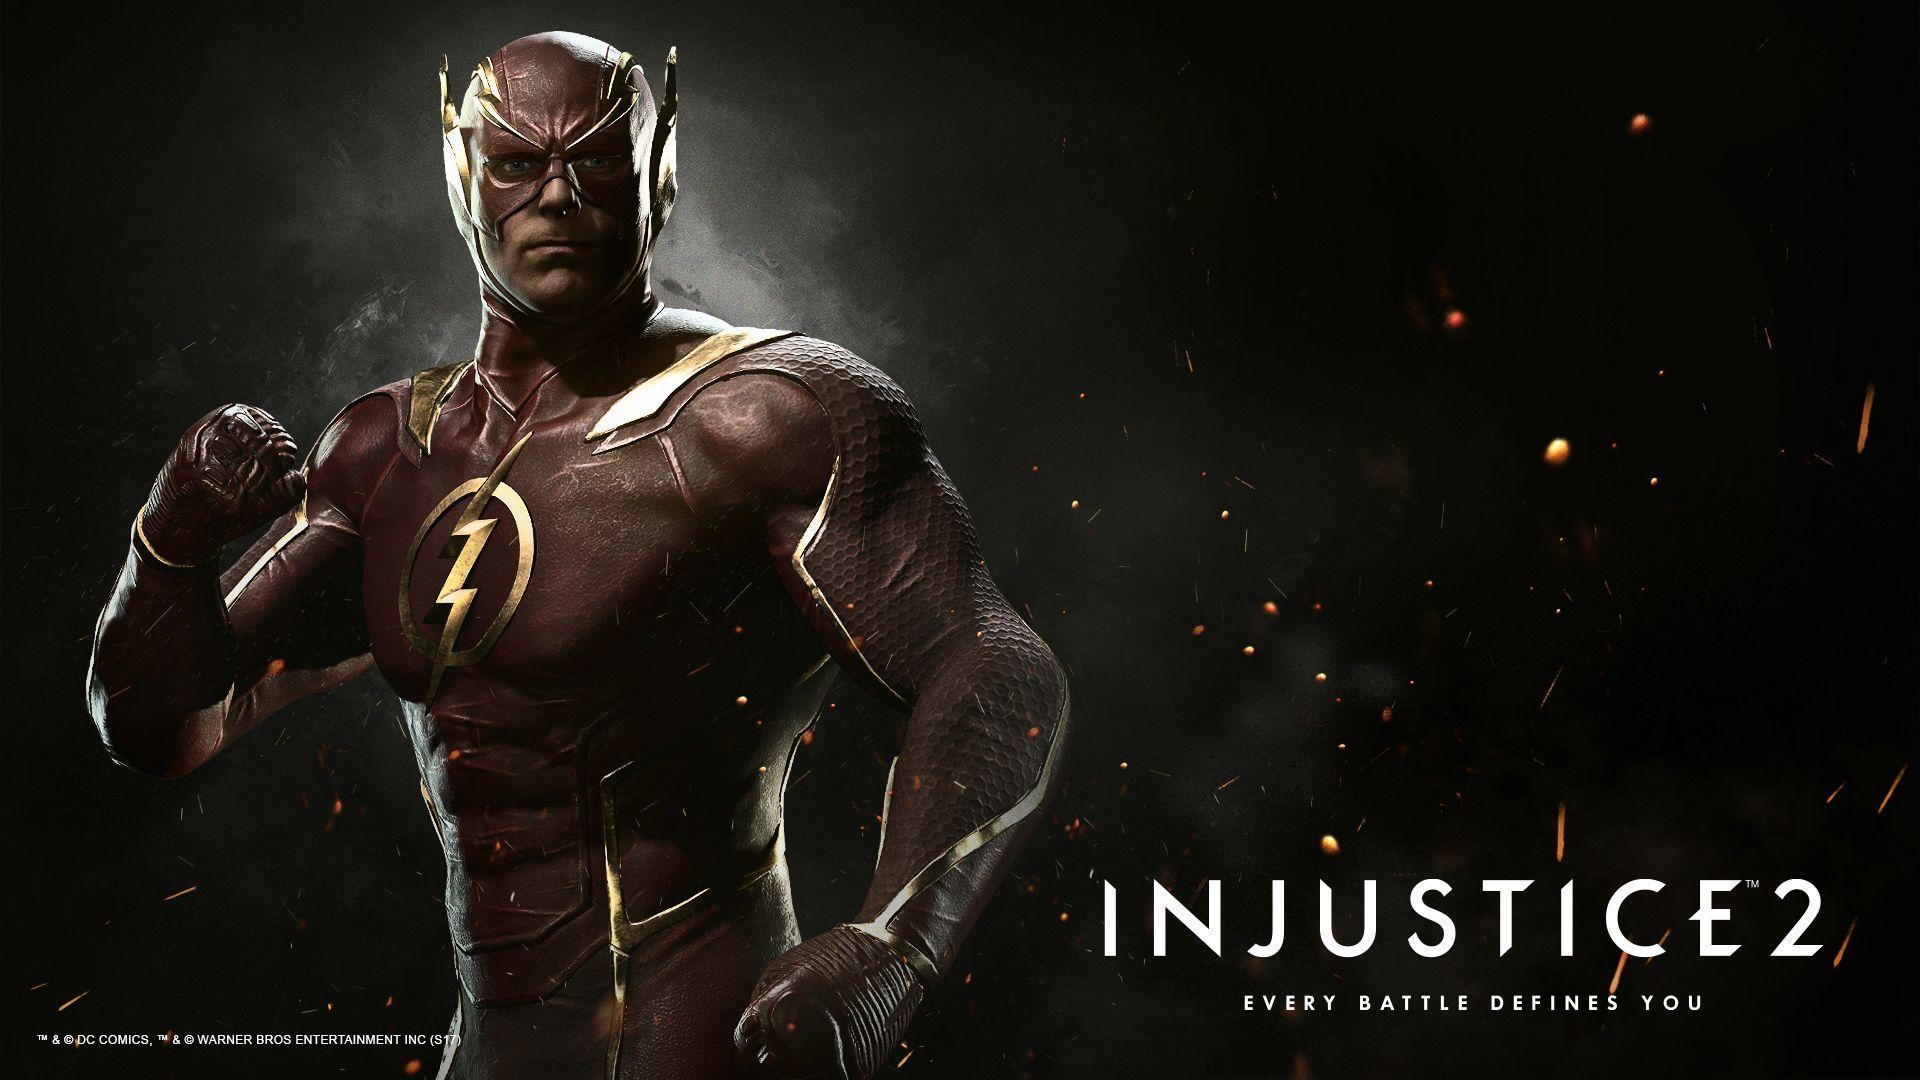 Barry Allen (Injustice)